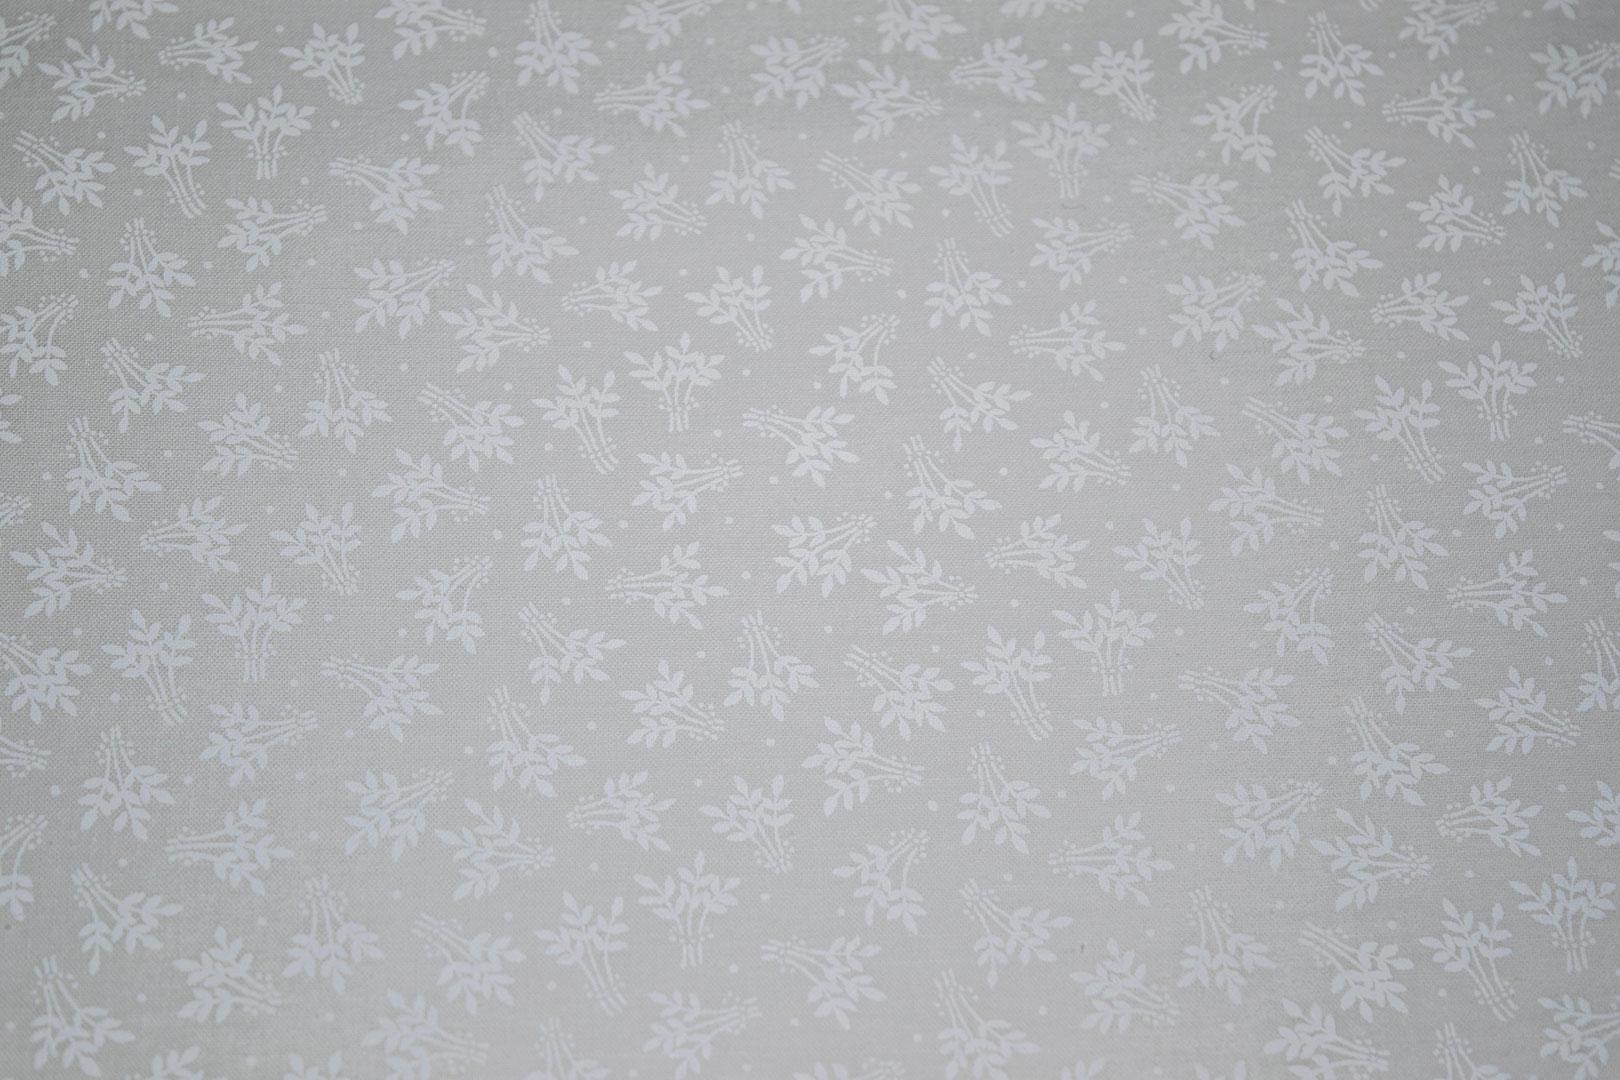 "8_36249_ww   44/45"" 68/68, 100% Carded Cotton"